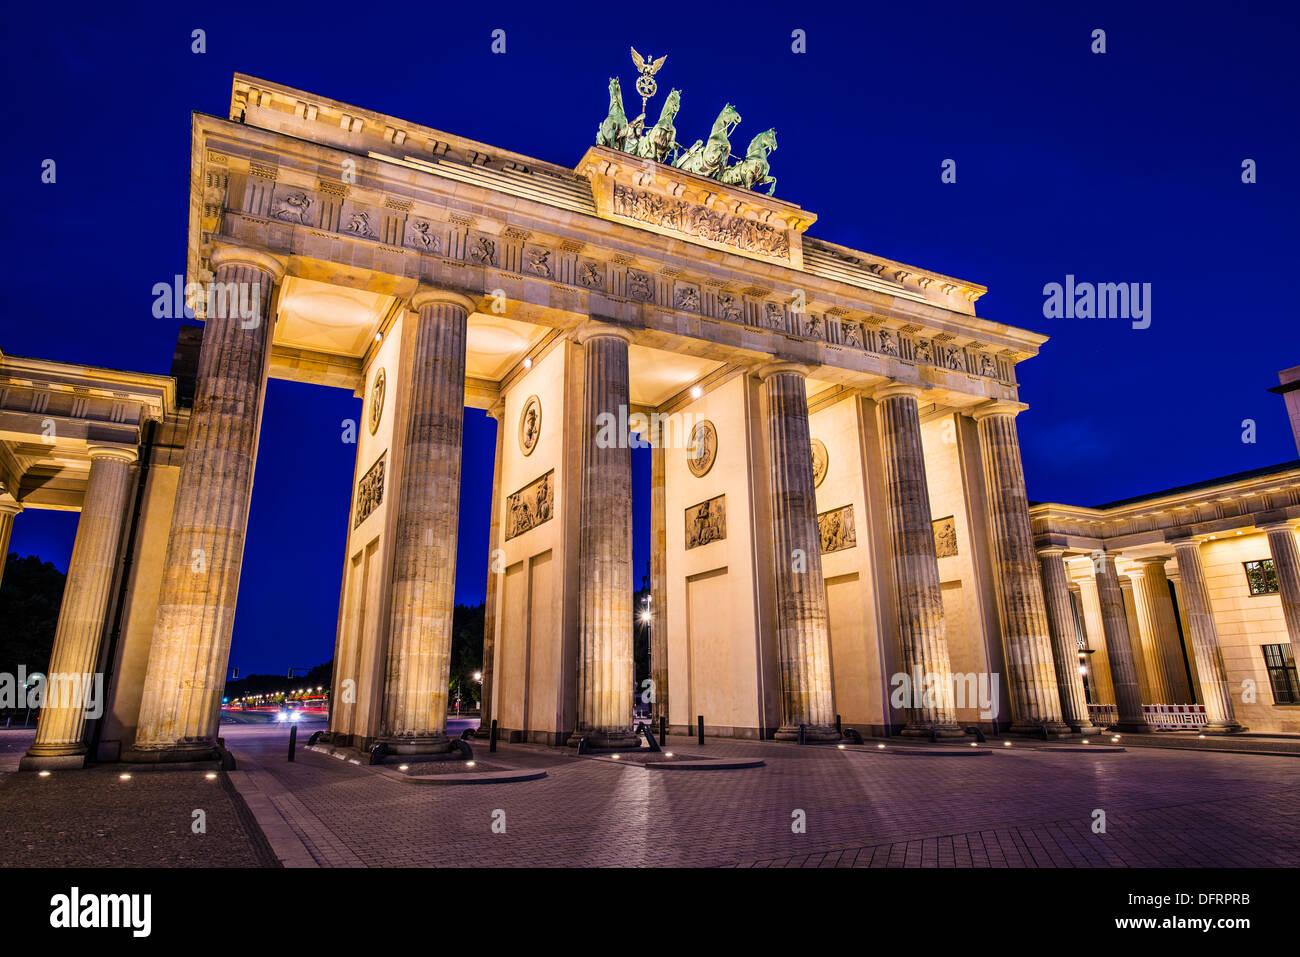 Puerta de Brandenburgo en Berlín, Alemania. Puerta de Brandenburgo en Berlín, Alemania. Imagen De Stock